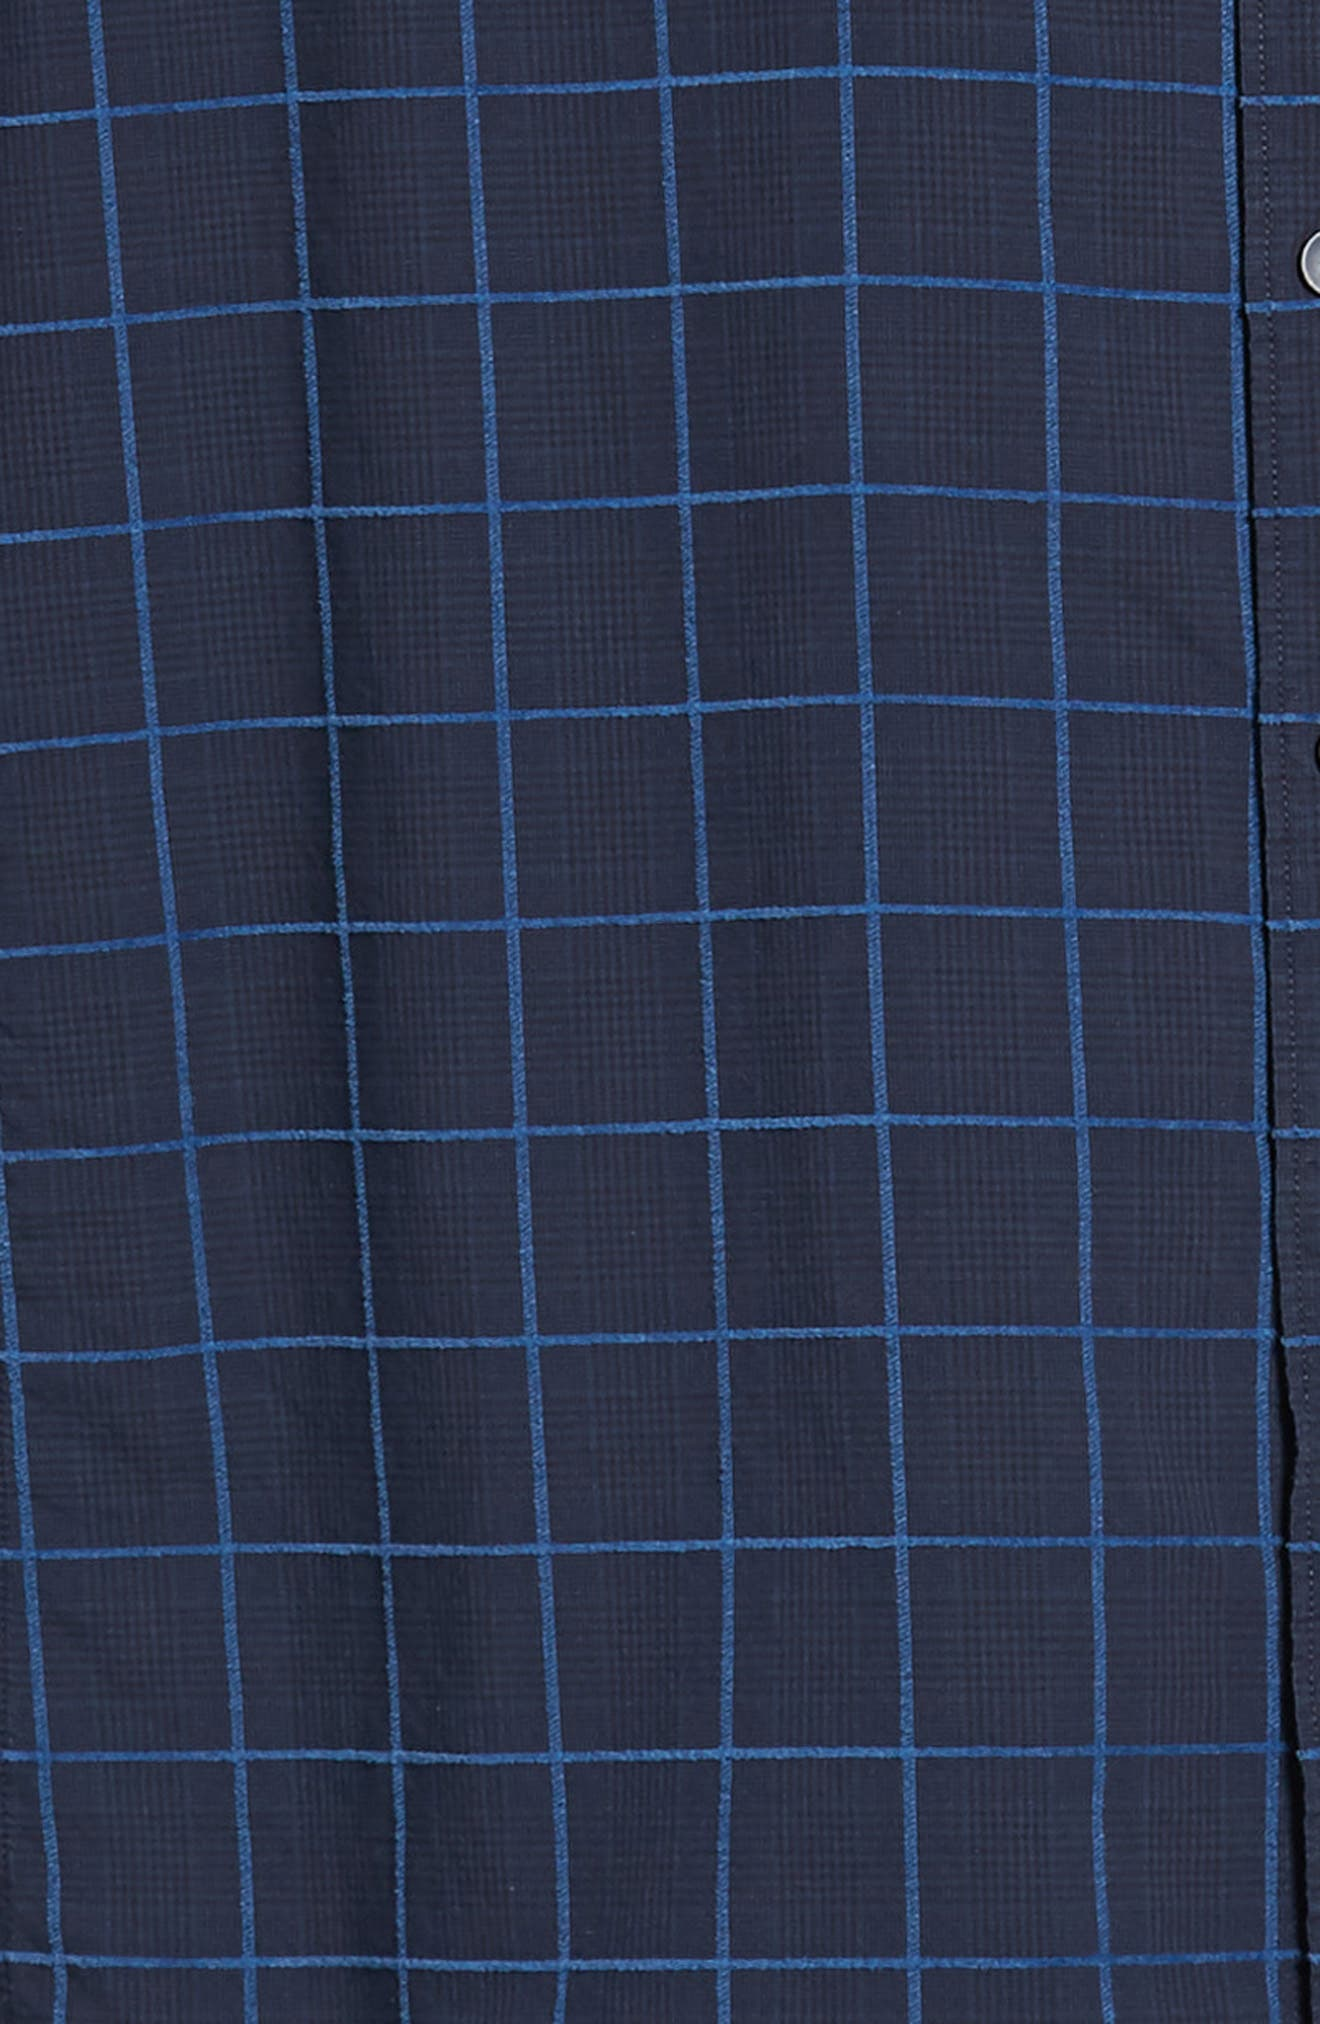 RODD & GUNN, Hindley Creek Regular Fit Sport Shirt, Alternate thumbnail 6, color, NAVY